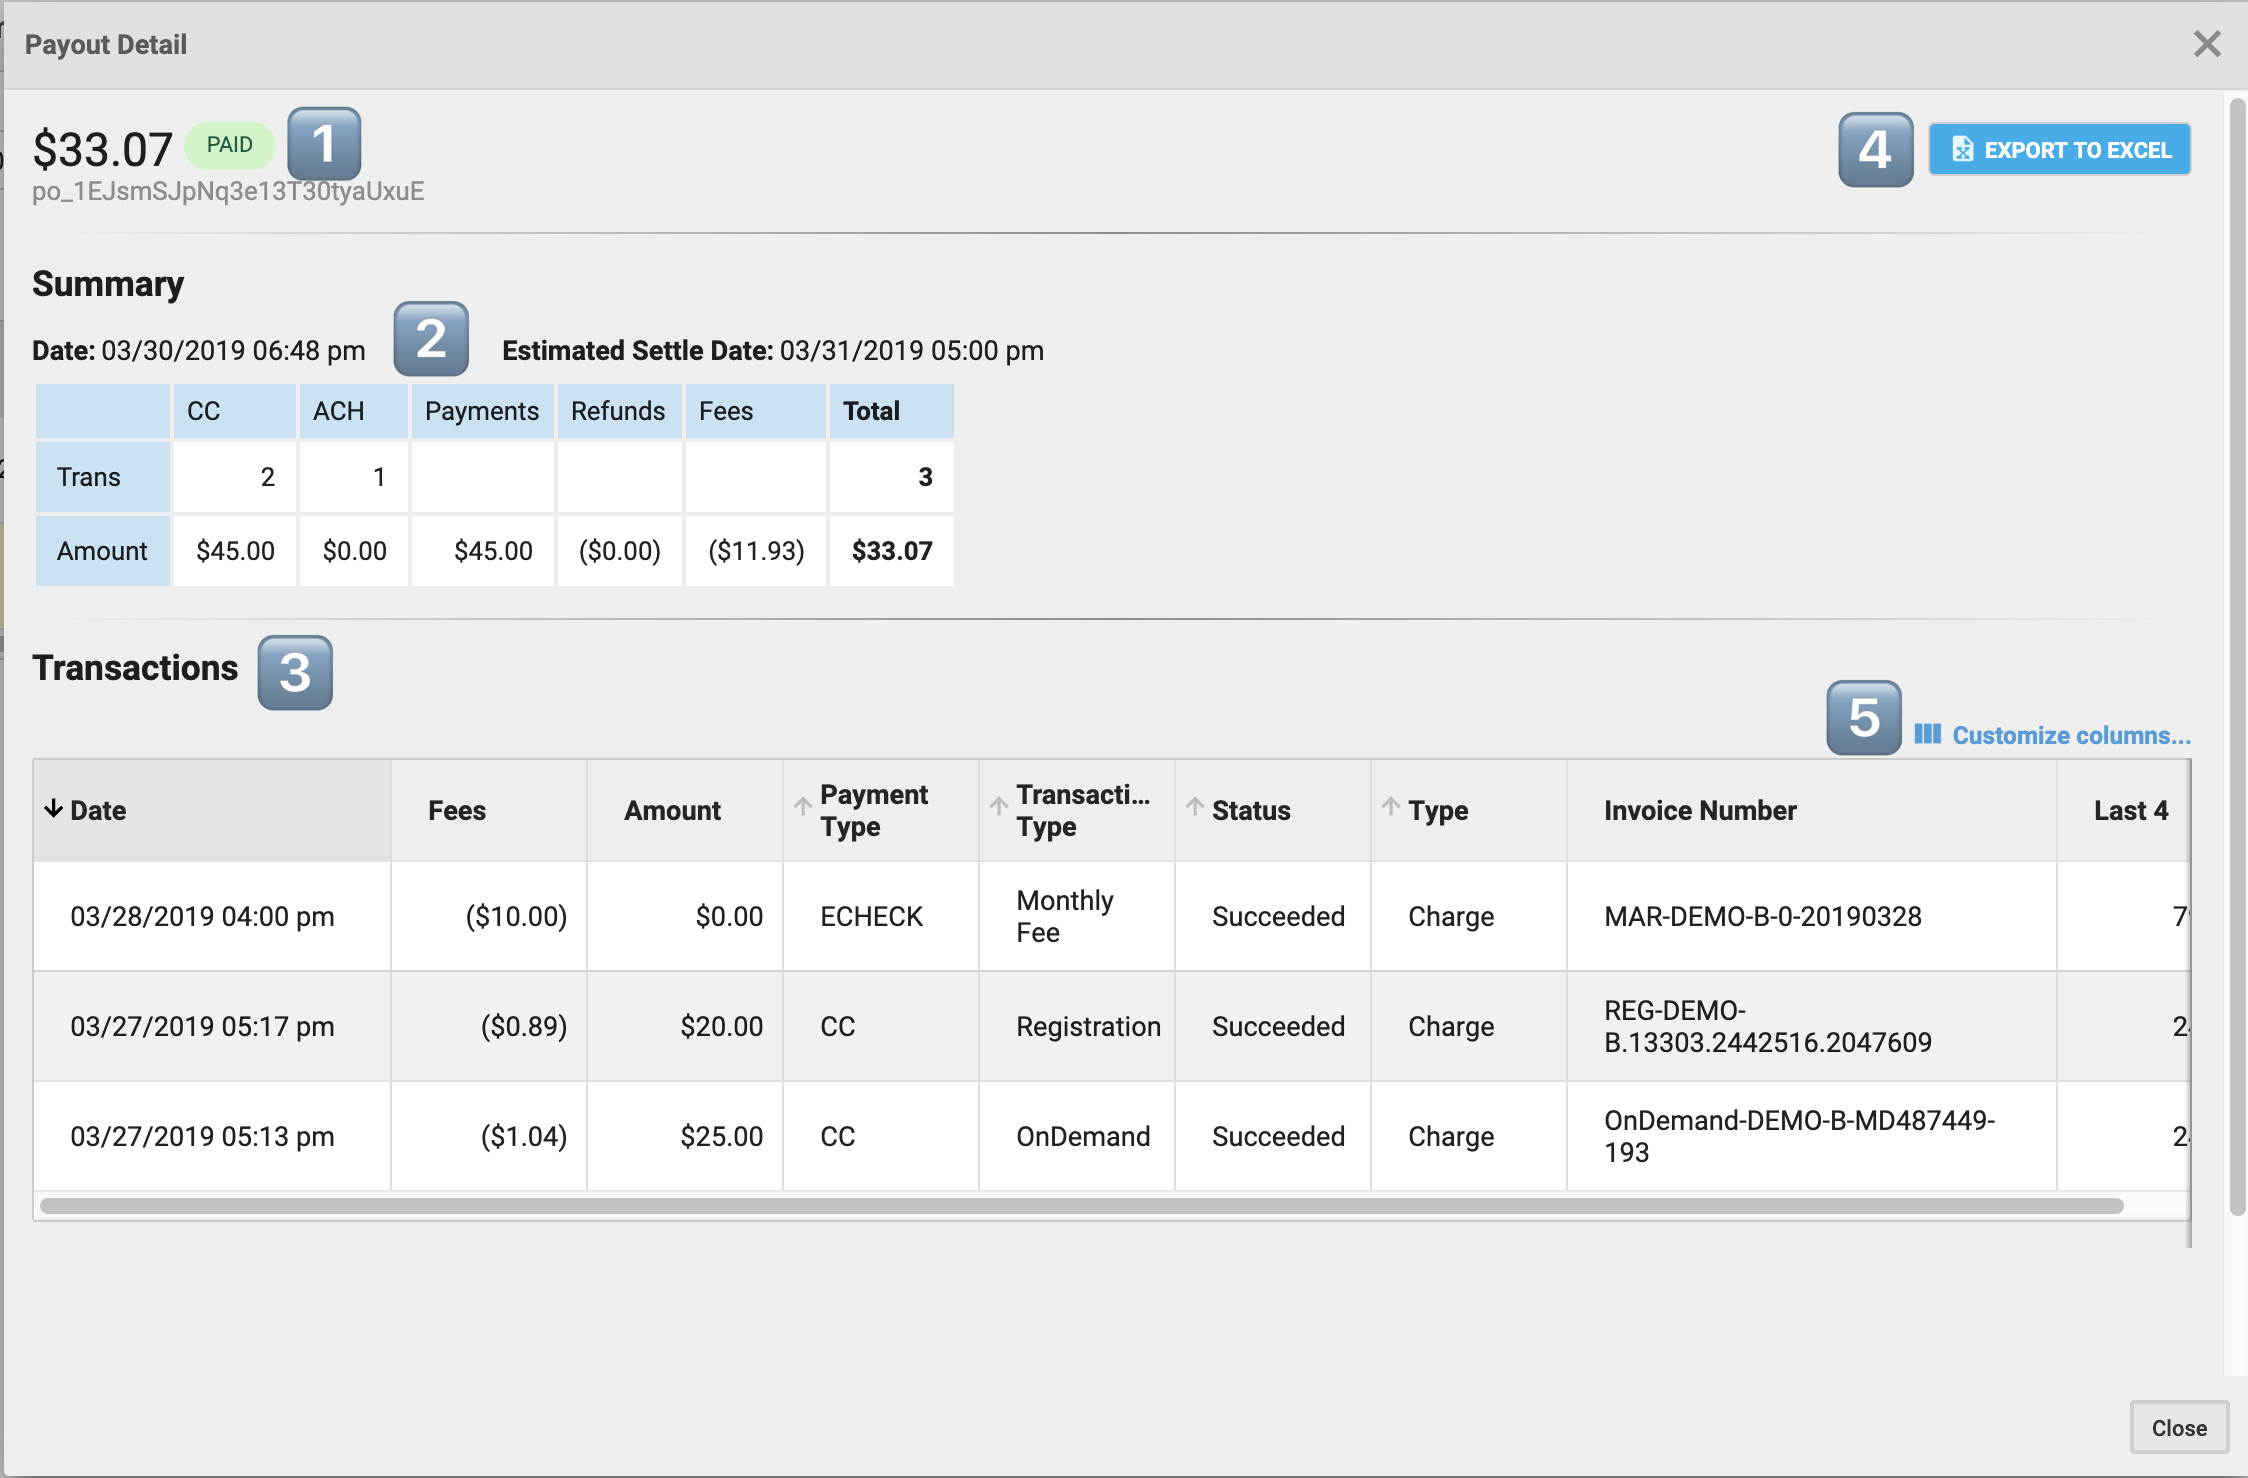 Payment Detail screen